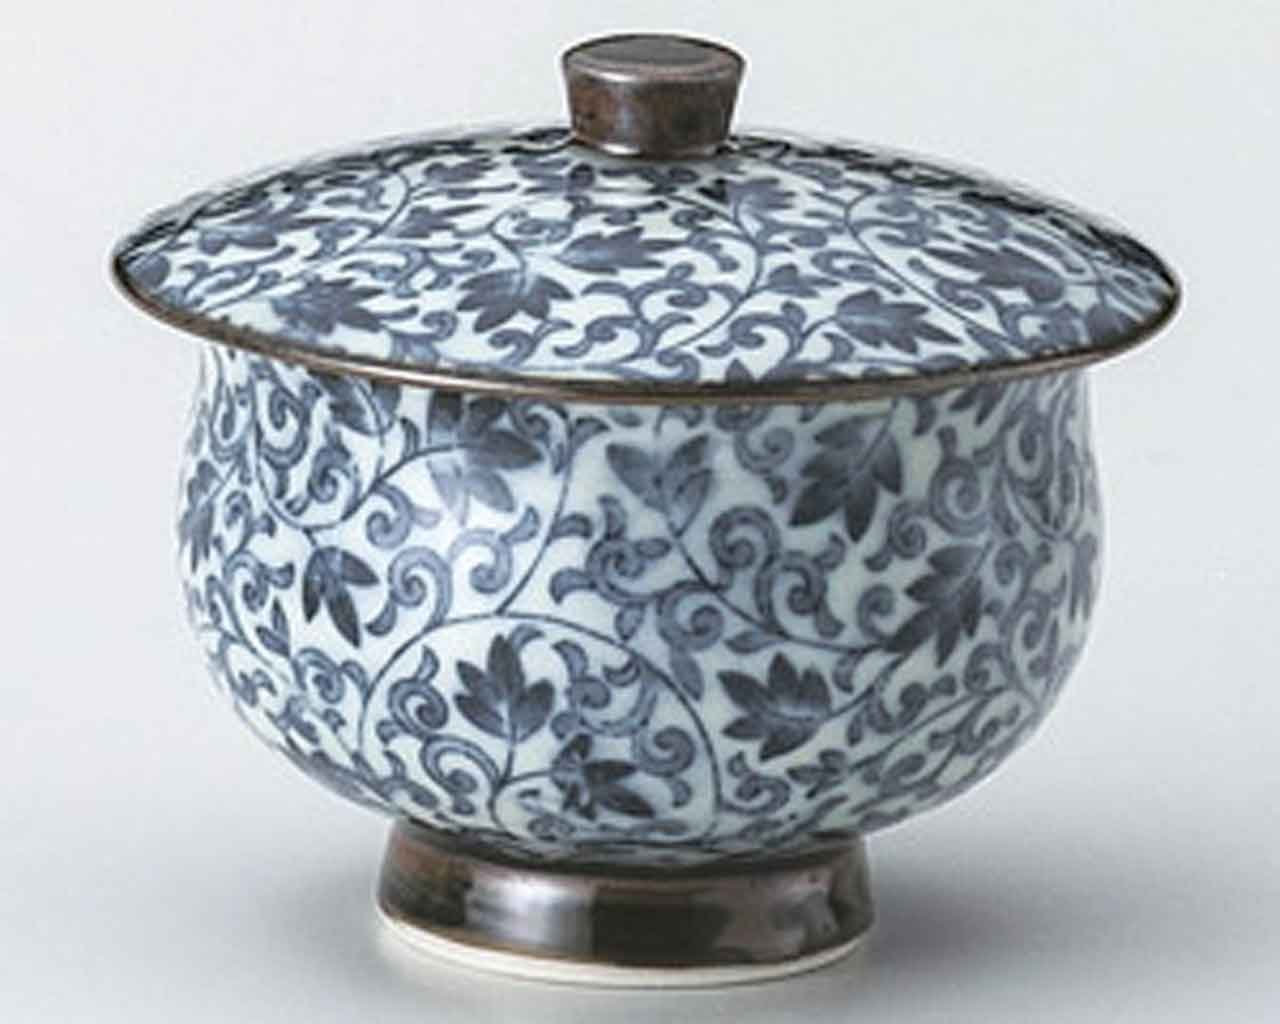 Karakusa 3.1inch Set of 5 Japanese Tea Cups White porcelain Made in Japan by Watou.asia (Image #1)